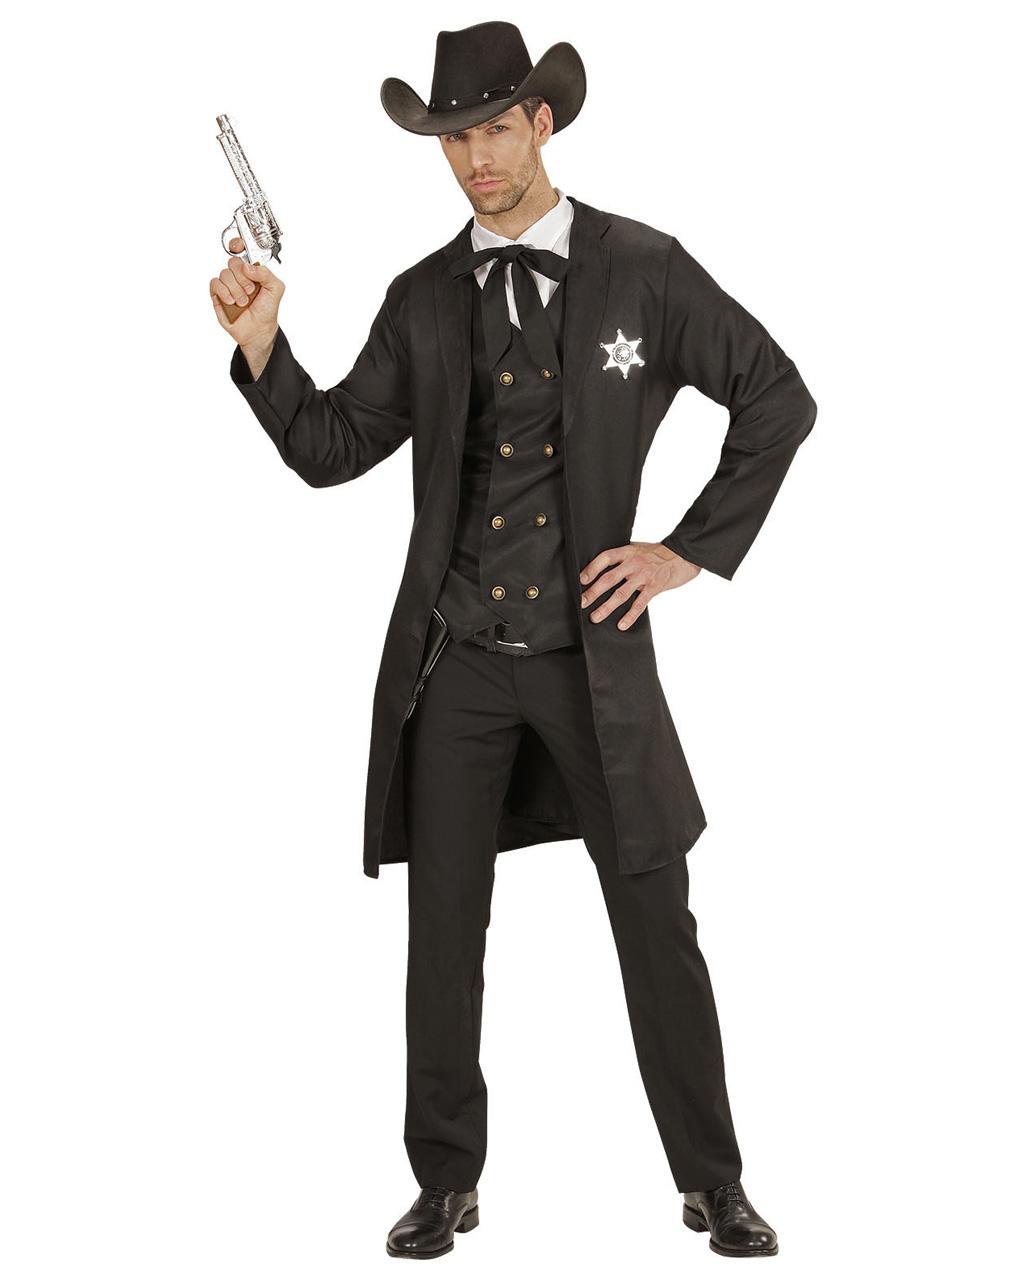 698881f4e1d Western Sheriff Costume 4 Pieces Herrenkostüm